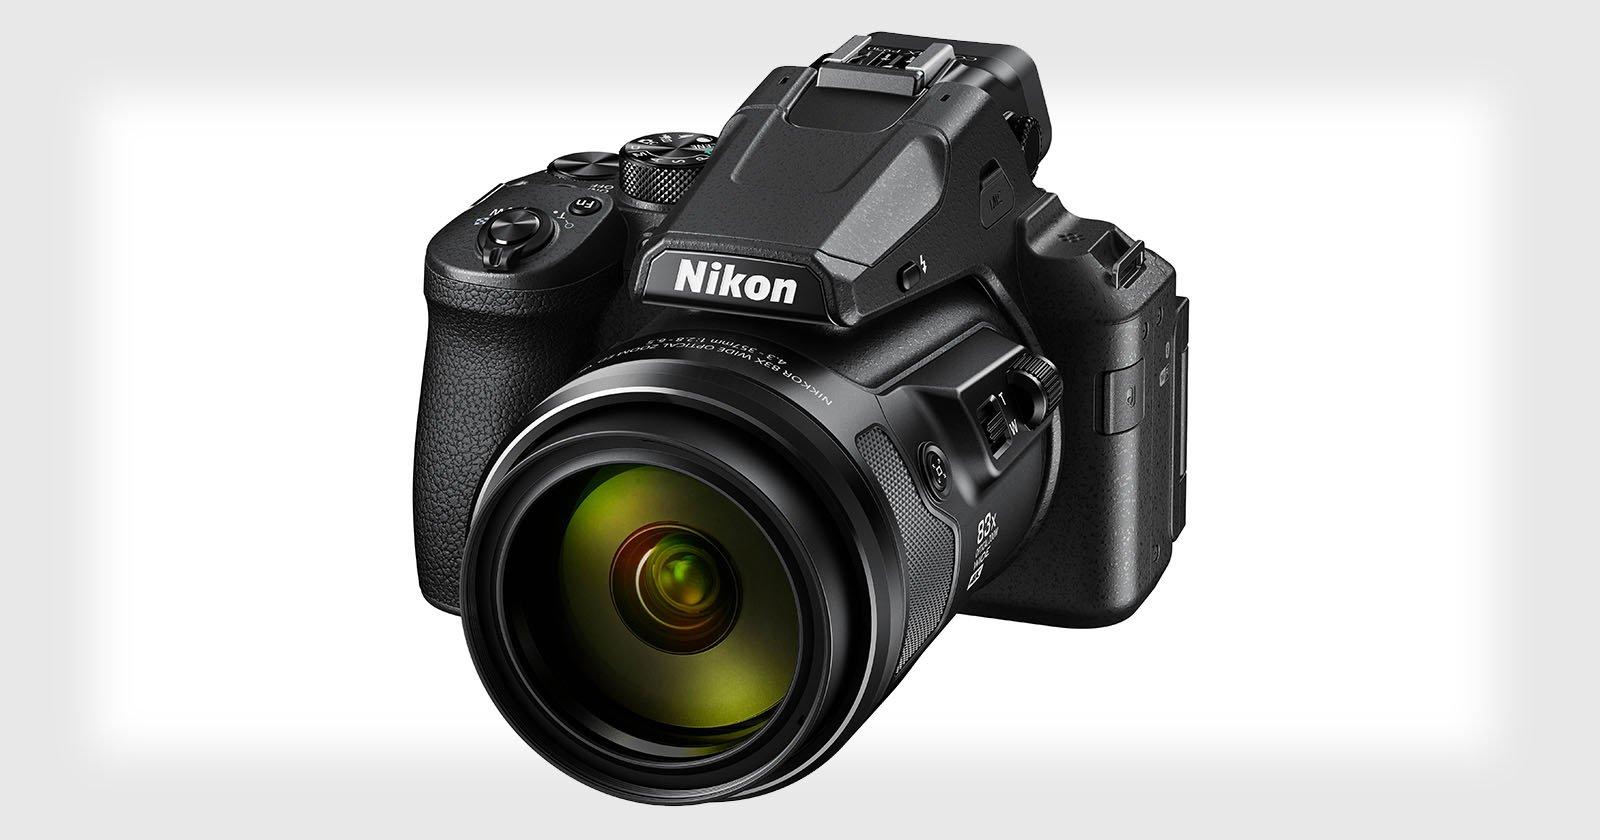 Kamera cover image